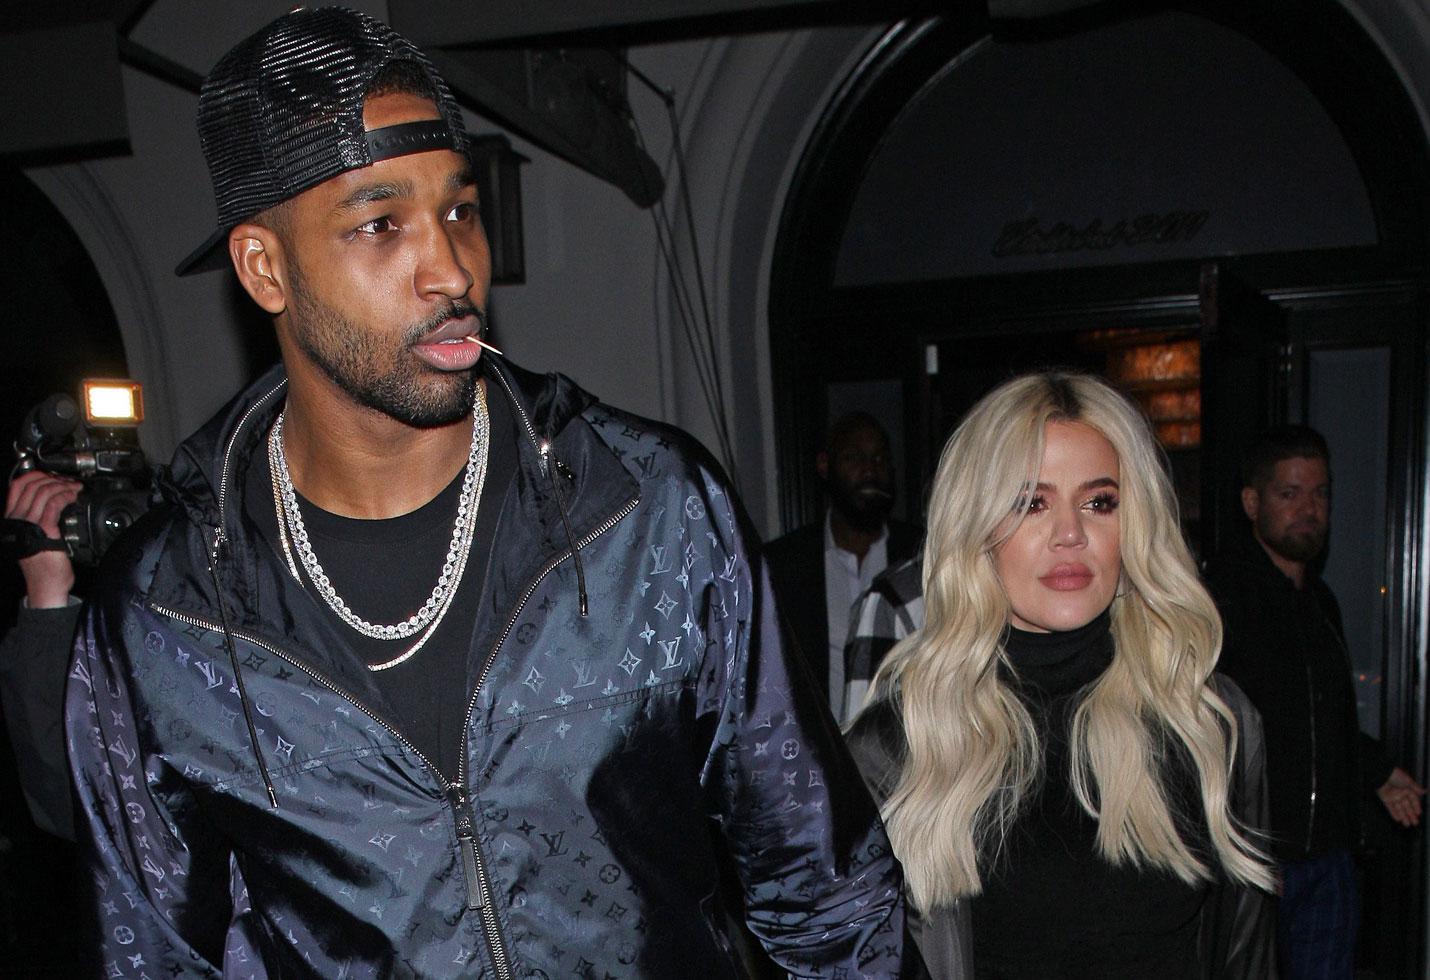 Khloe kardashian attends tristan thompson nba game los angeles photos